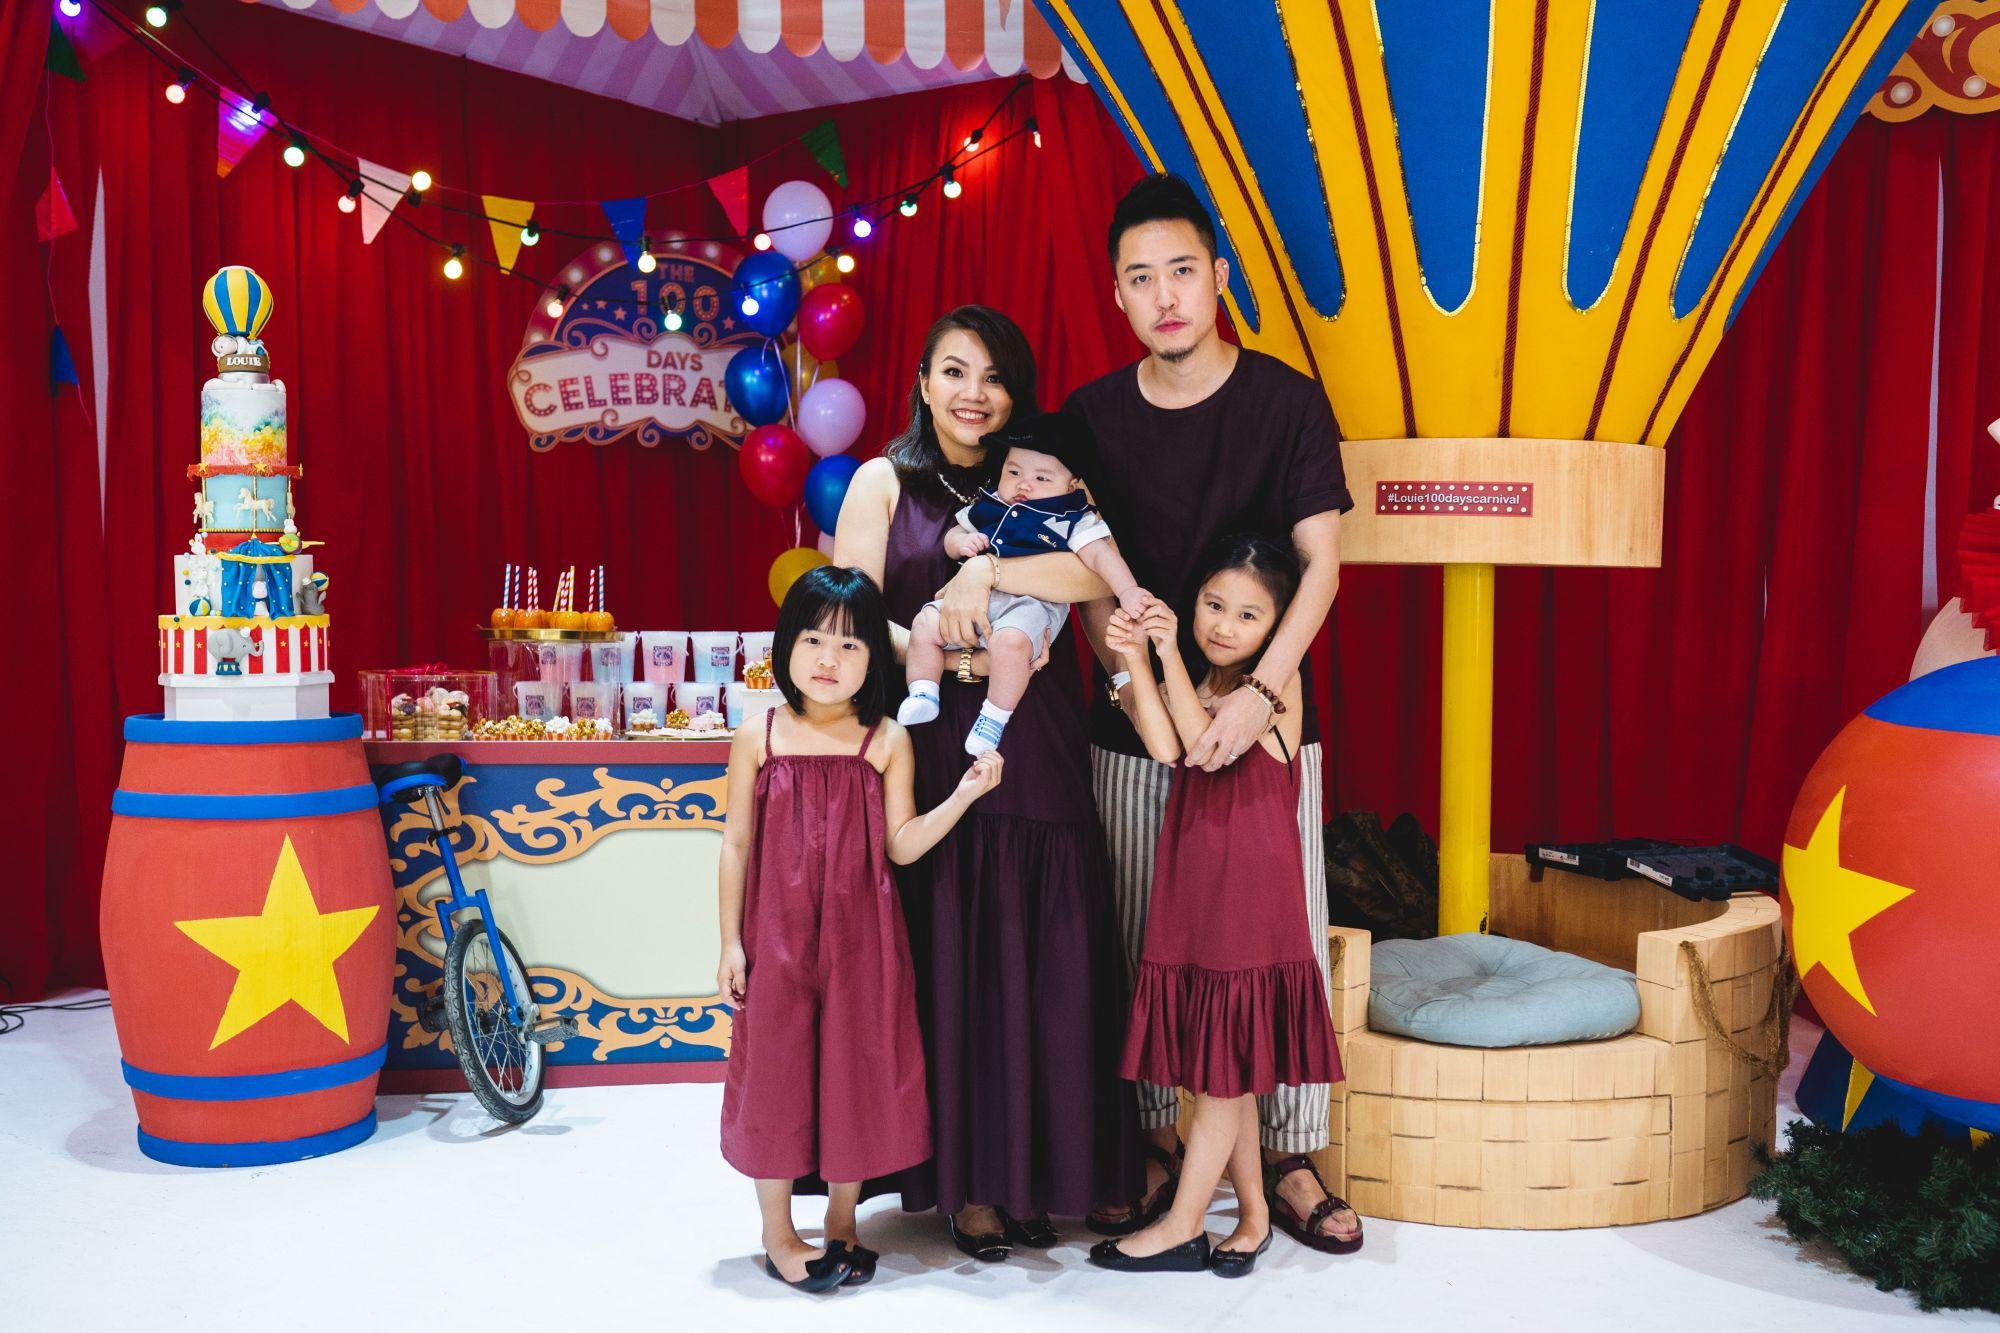 Bryan Loo and Sally Quah with Kylie Loo, Louie Loo and Hayley Loo